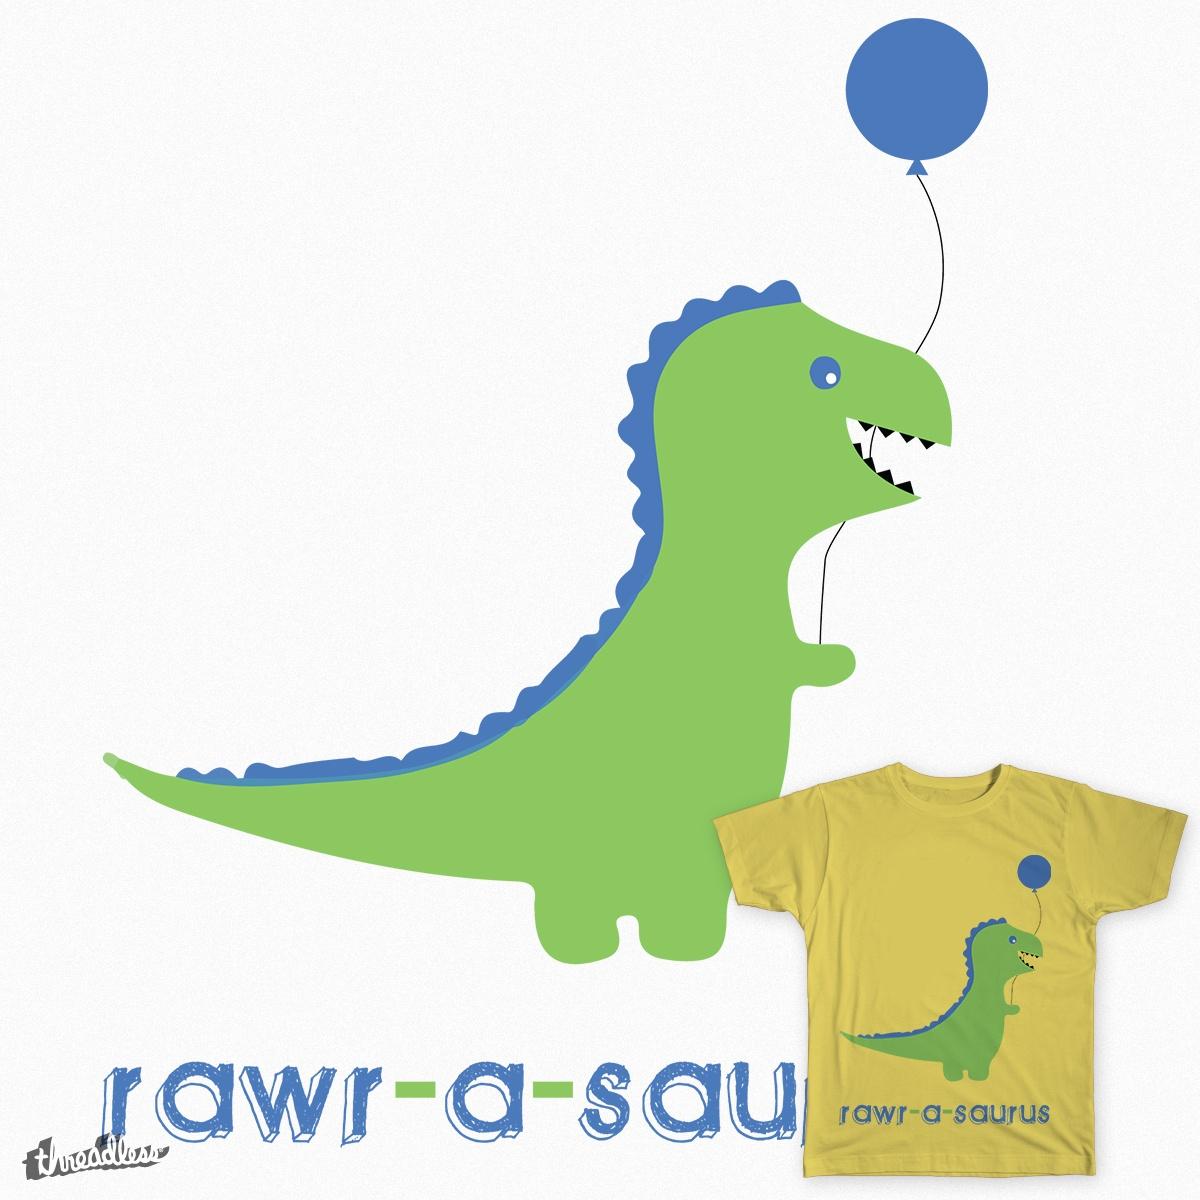 RAWR-A-SAURUS, a cool t-shirt design